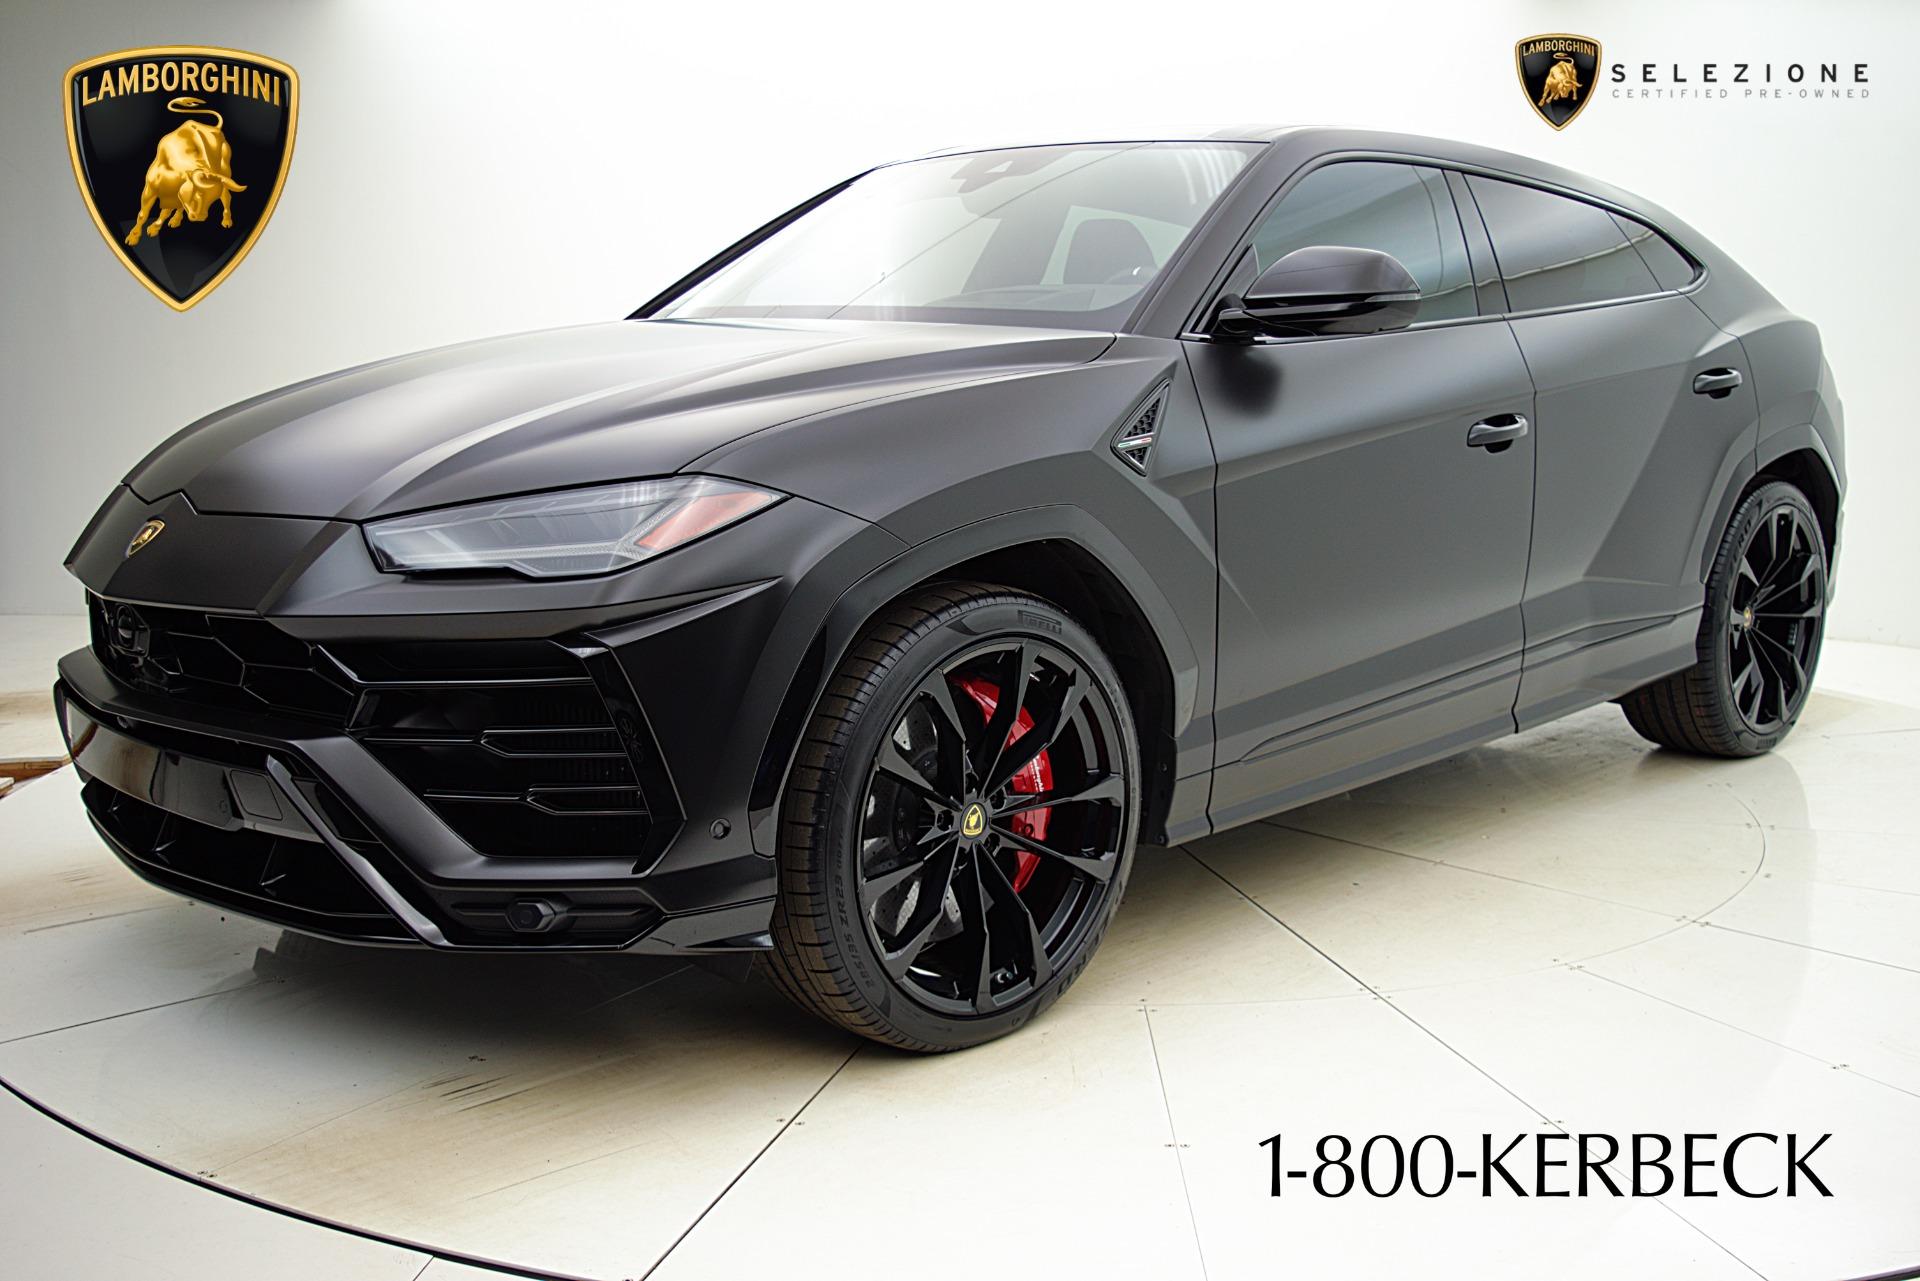 Used 2019 Lamborghini Urus for sale $255,880 at Bentley Palmyra N.J. in Palmyra NJ 08065 2